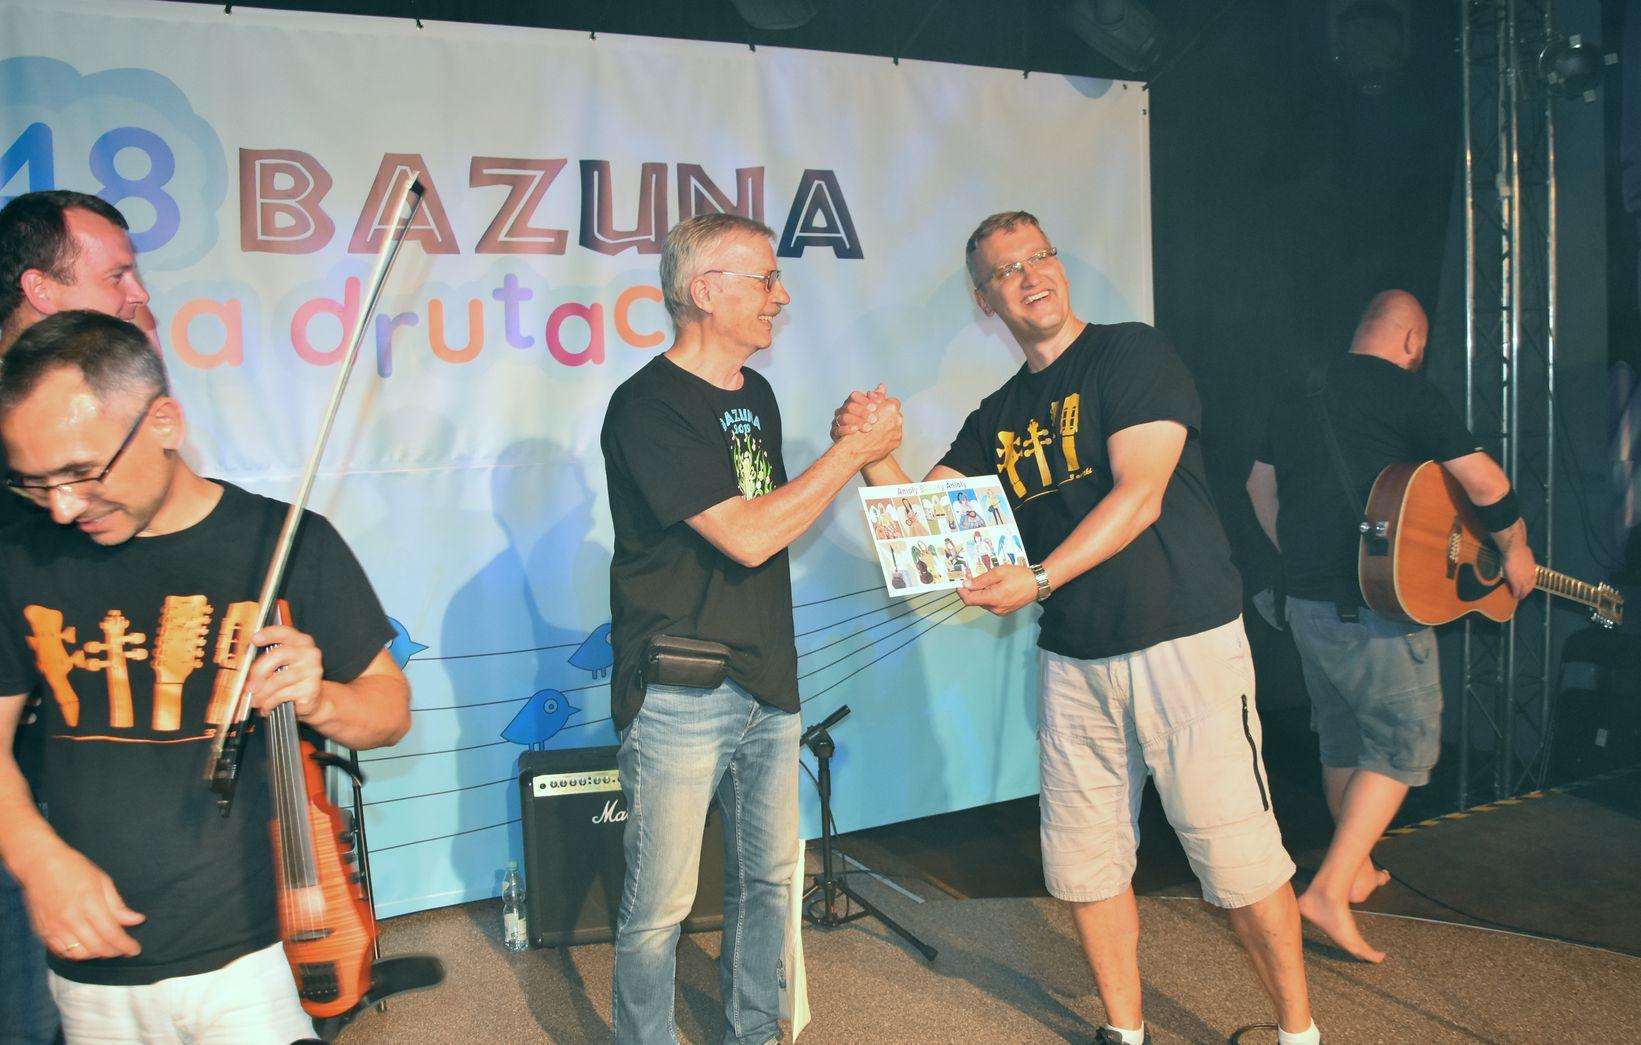 BAZUNA 2020 fot_Janusz Wikowski A31_0348